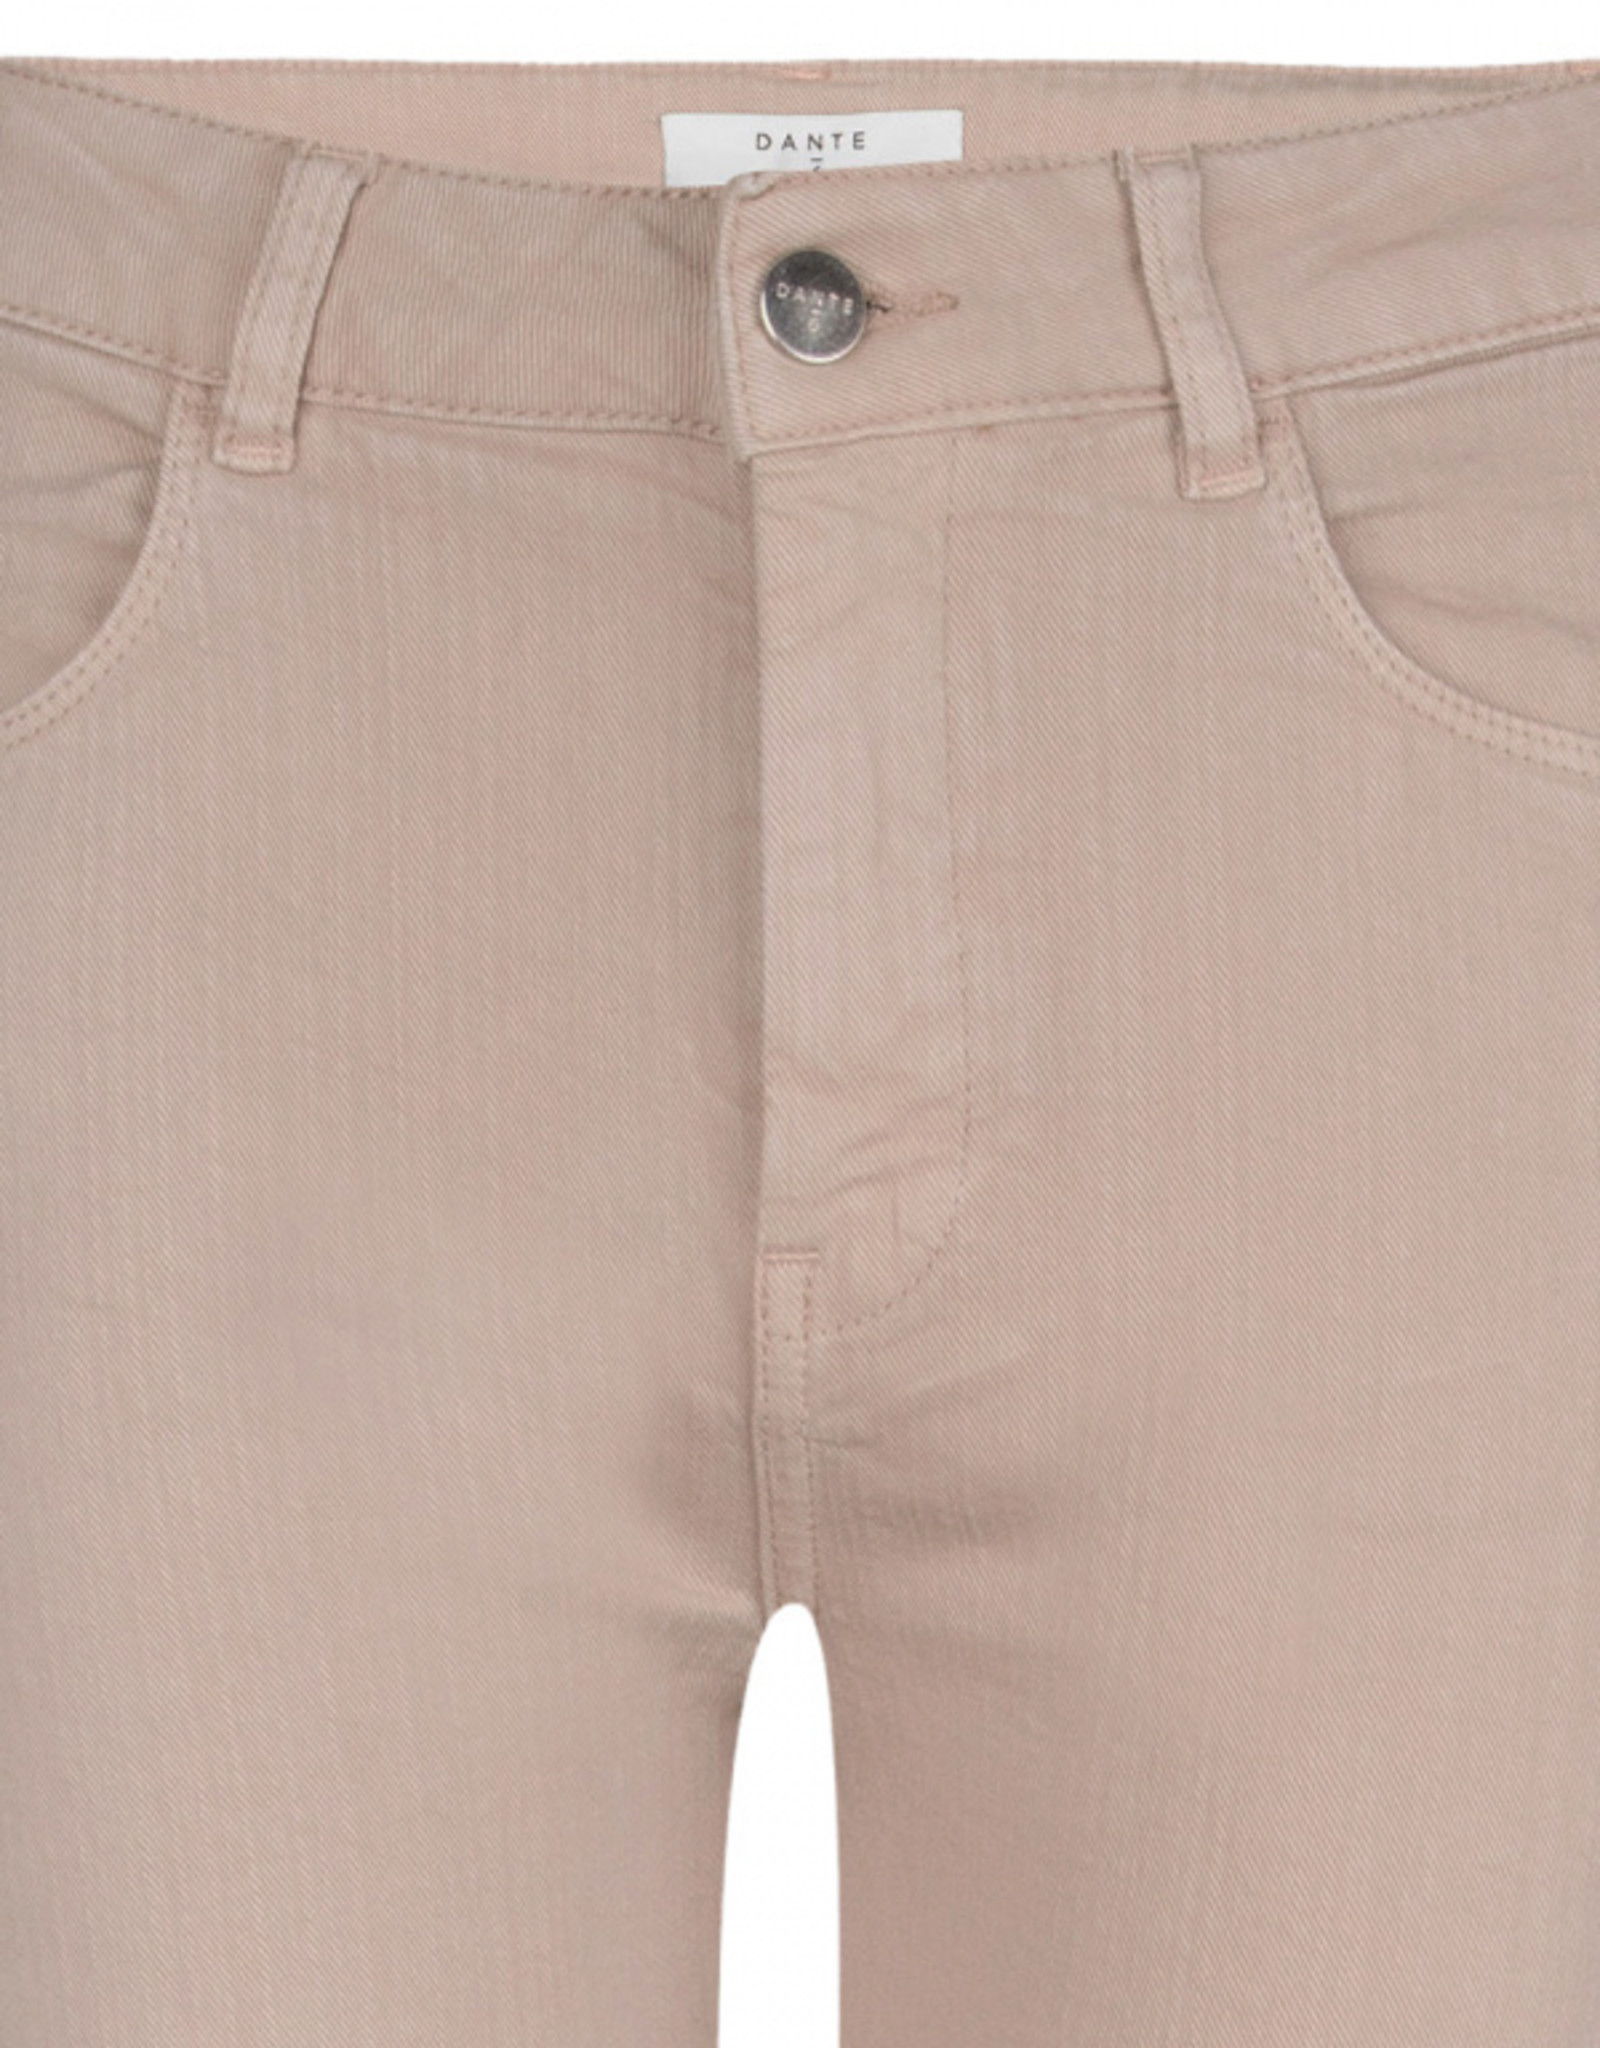 Dante 6 Billie Flare Stretch Pants Silver Birch